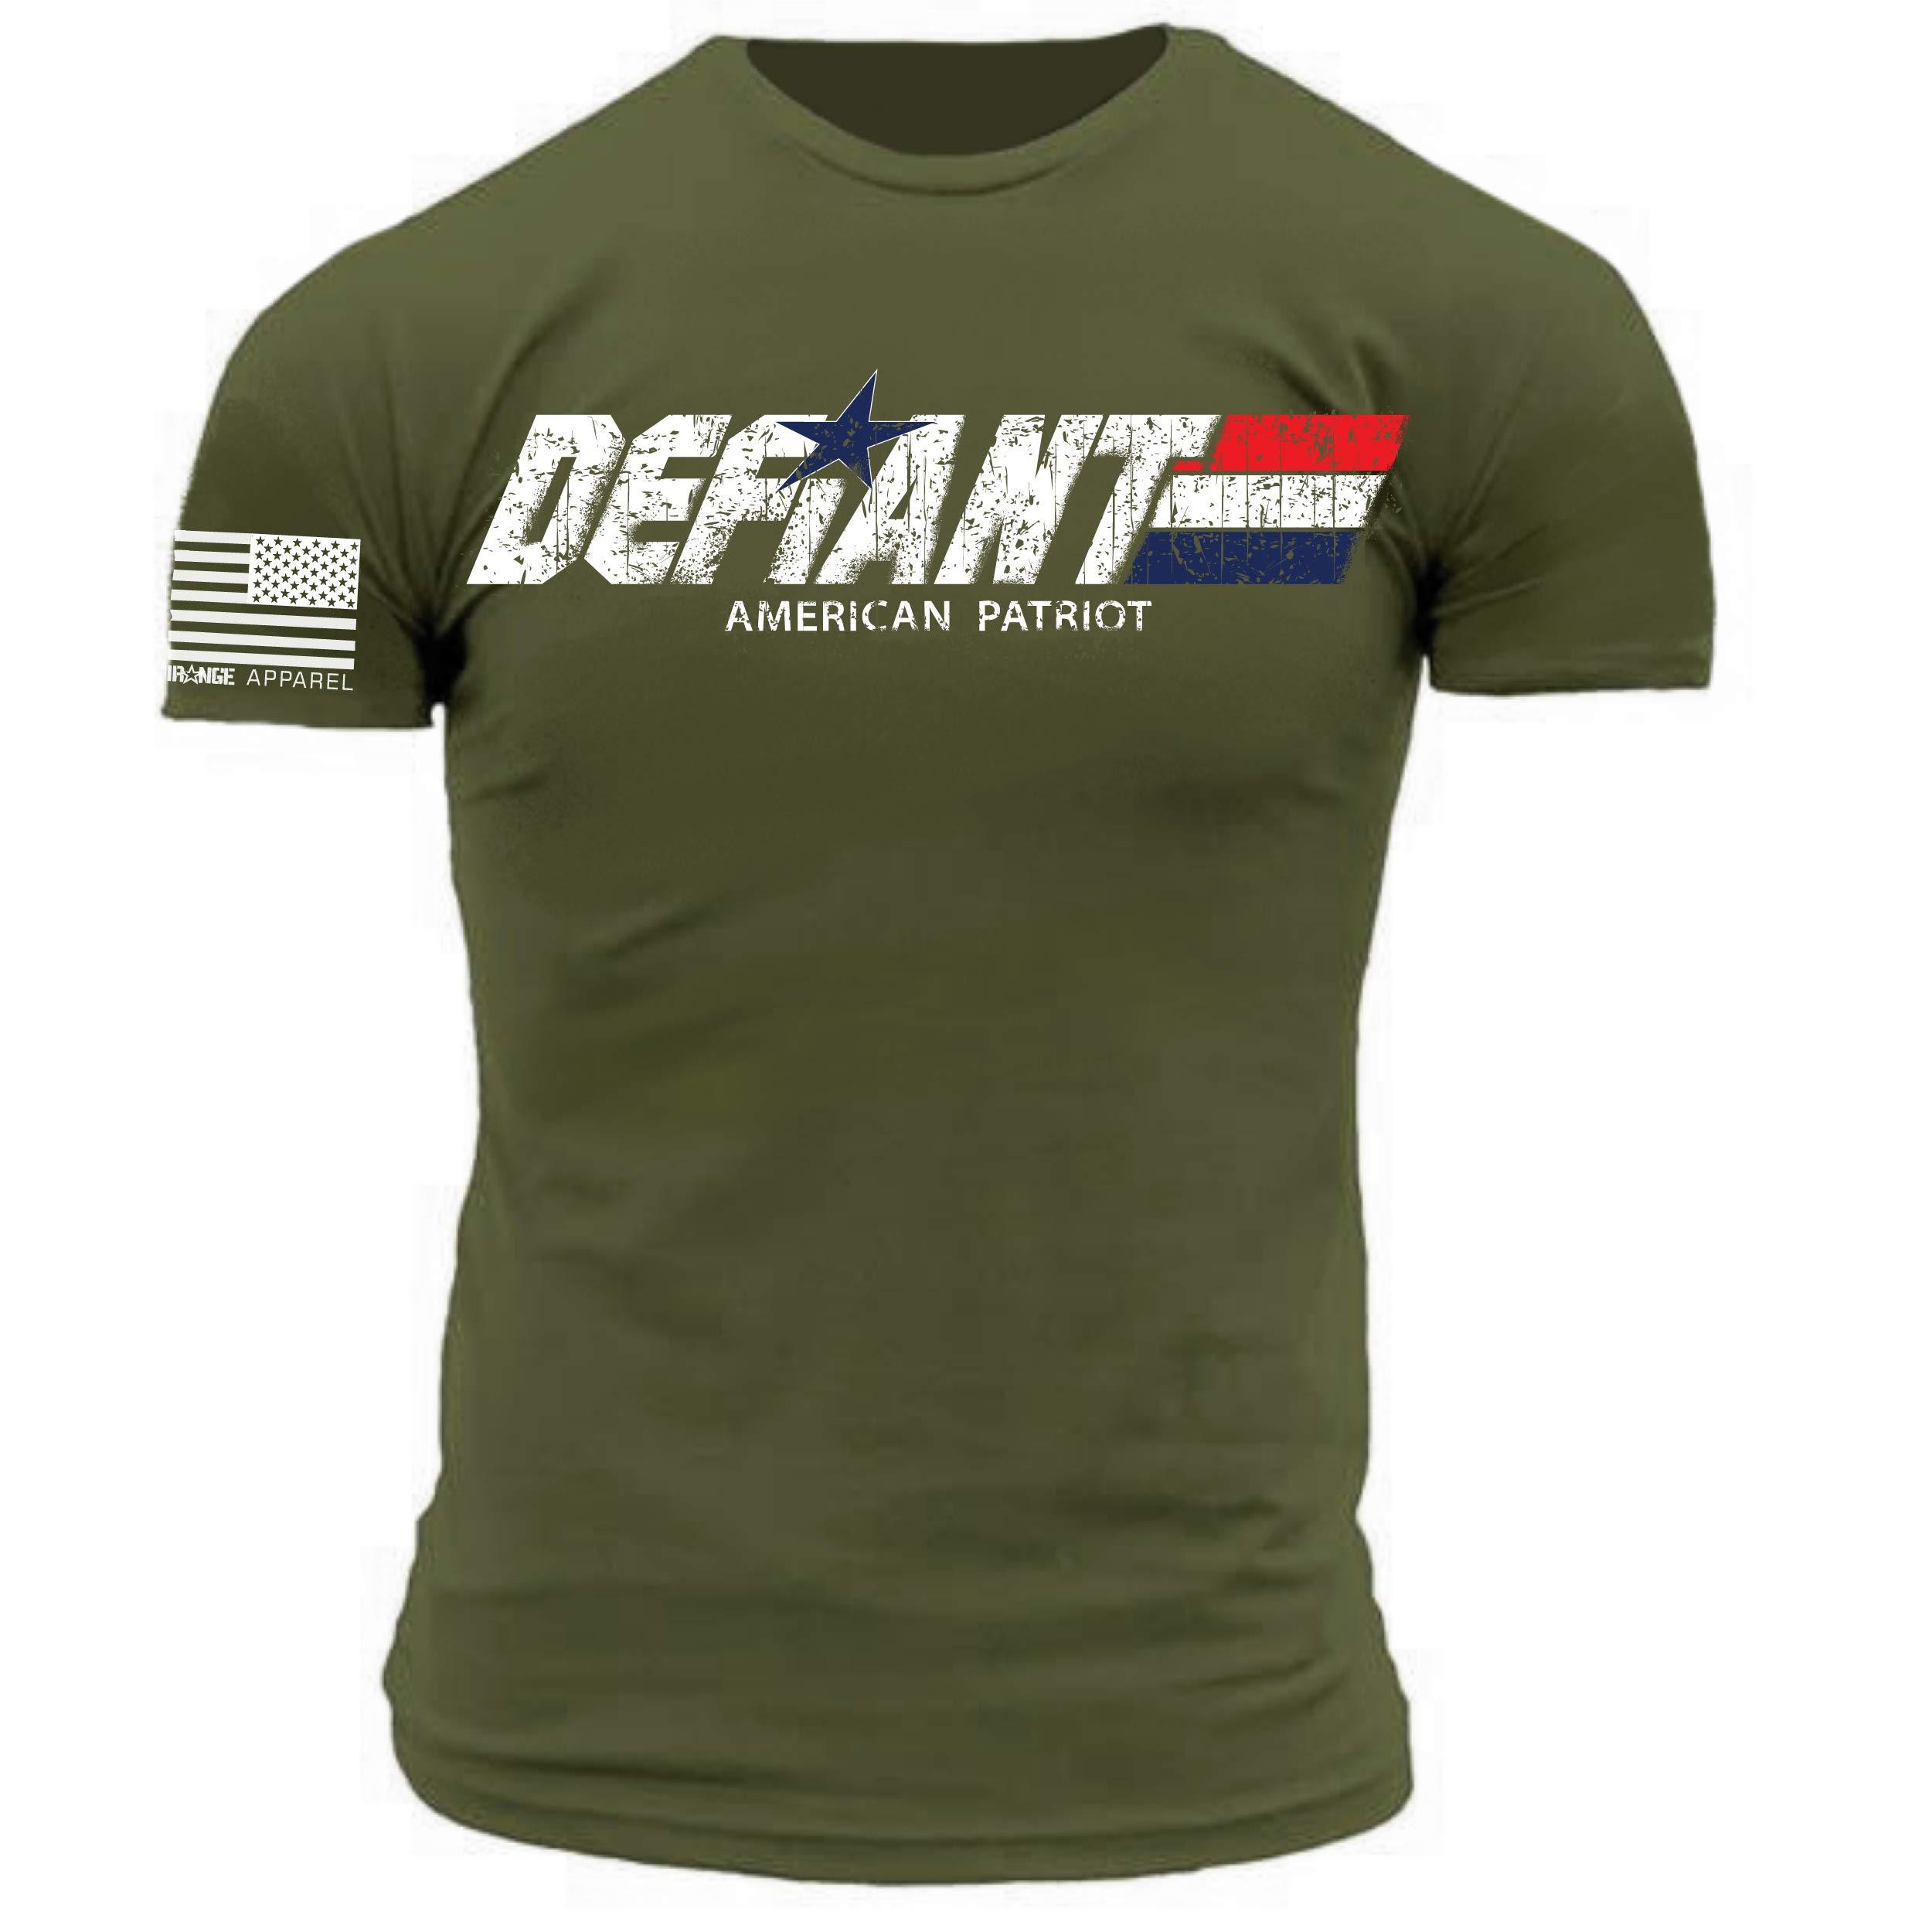 Defiant American Patriot Military Green Premium Athletic T Shirt 8031